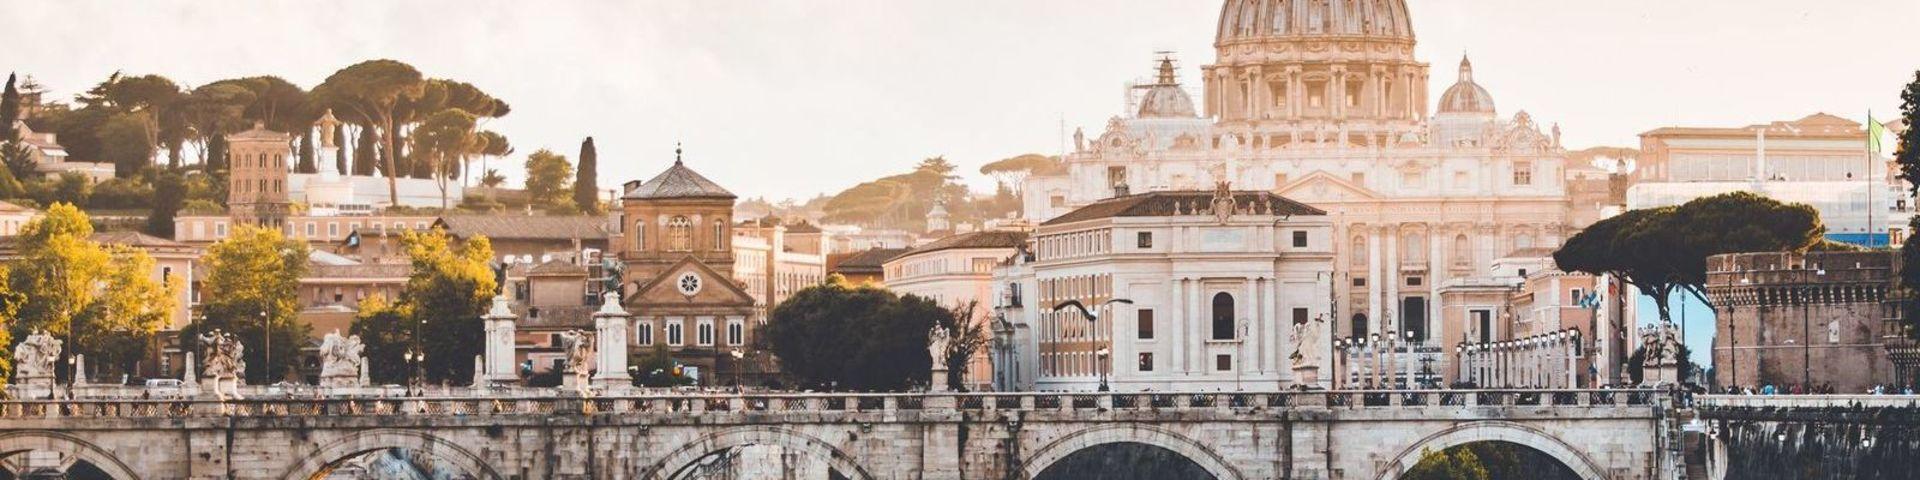 Ohne Risiko nach Italien